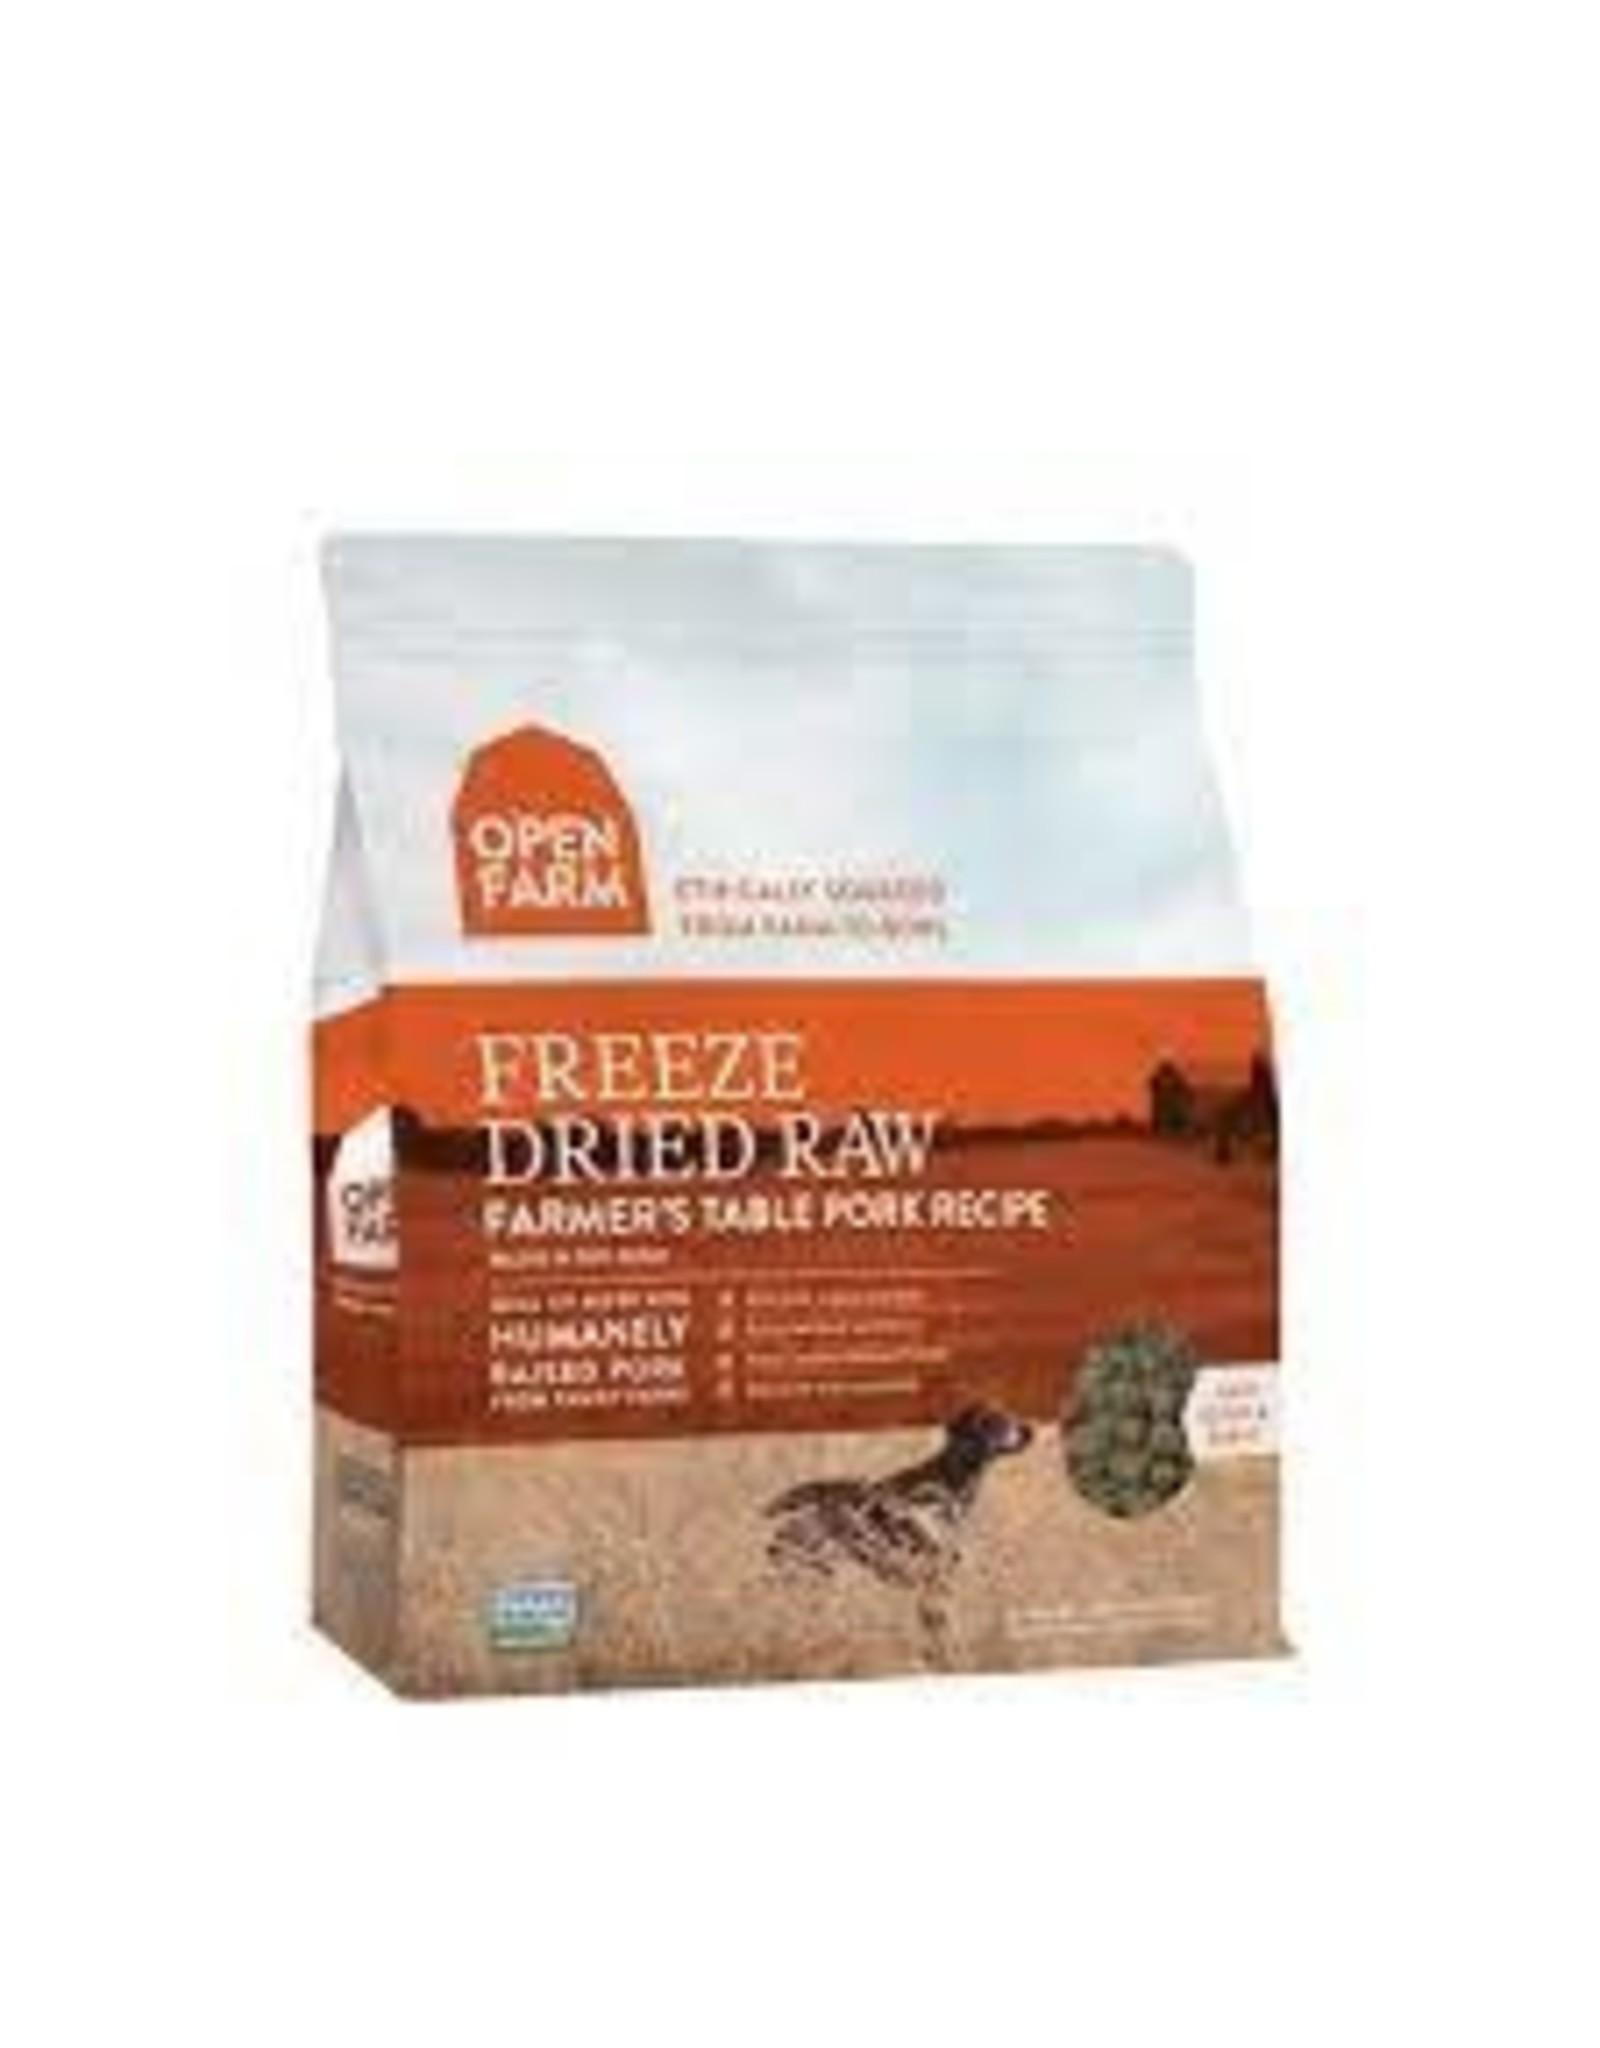 Open Farm Farmer's Table Pork Freeze-Dried